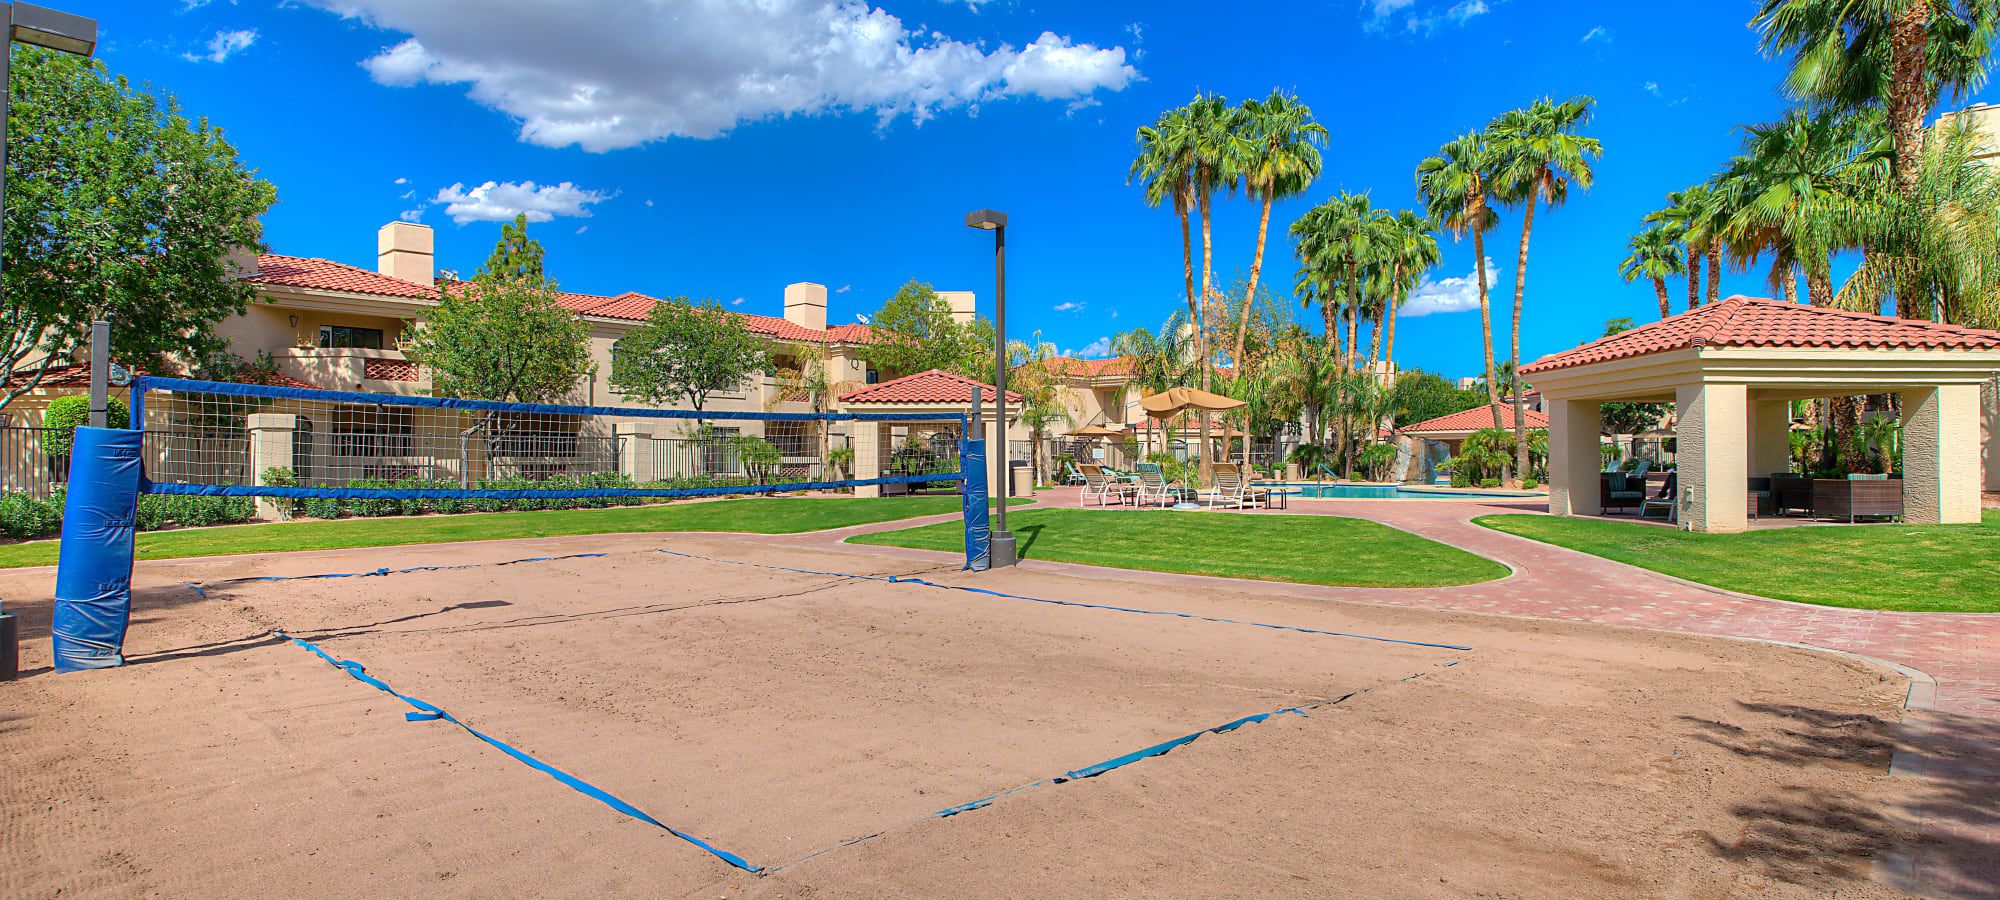 Onsite sand volleyball court at San Palmilla in Tempe, Arizona